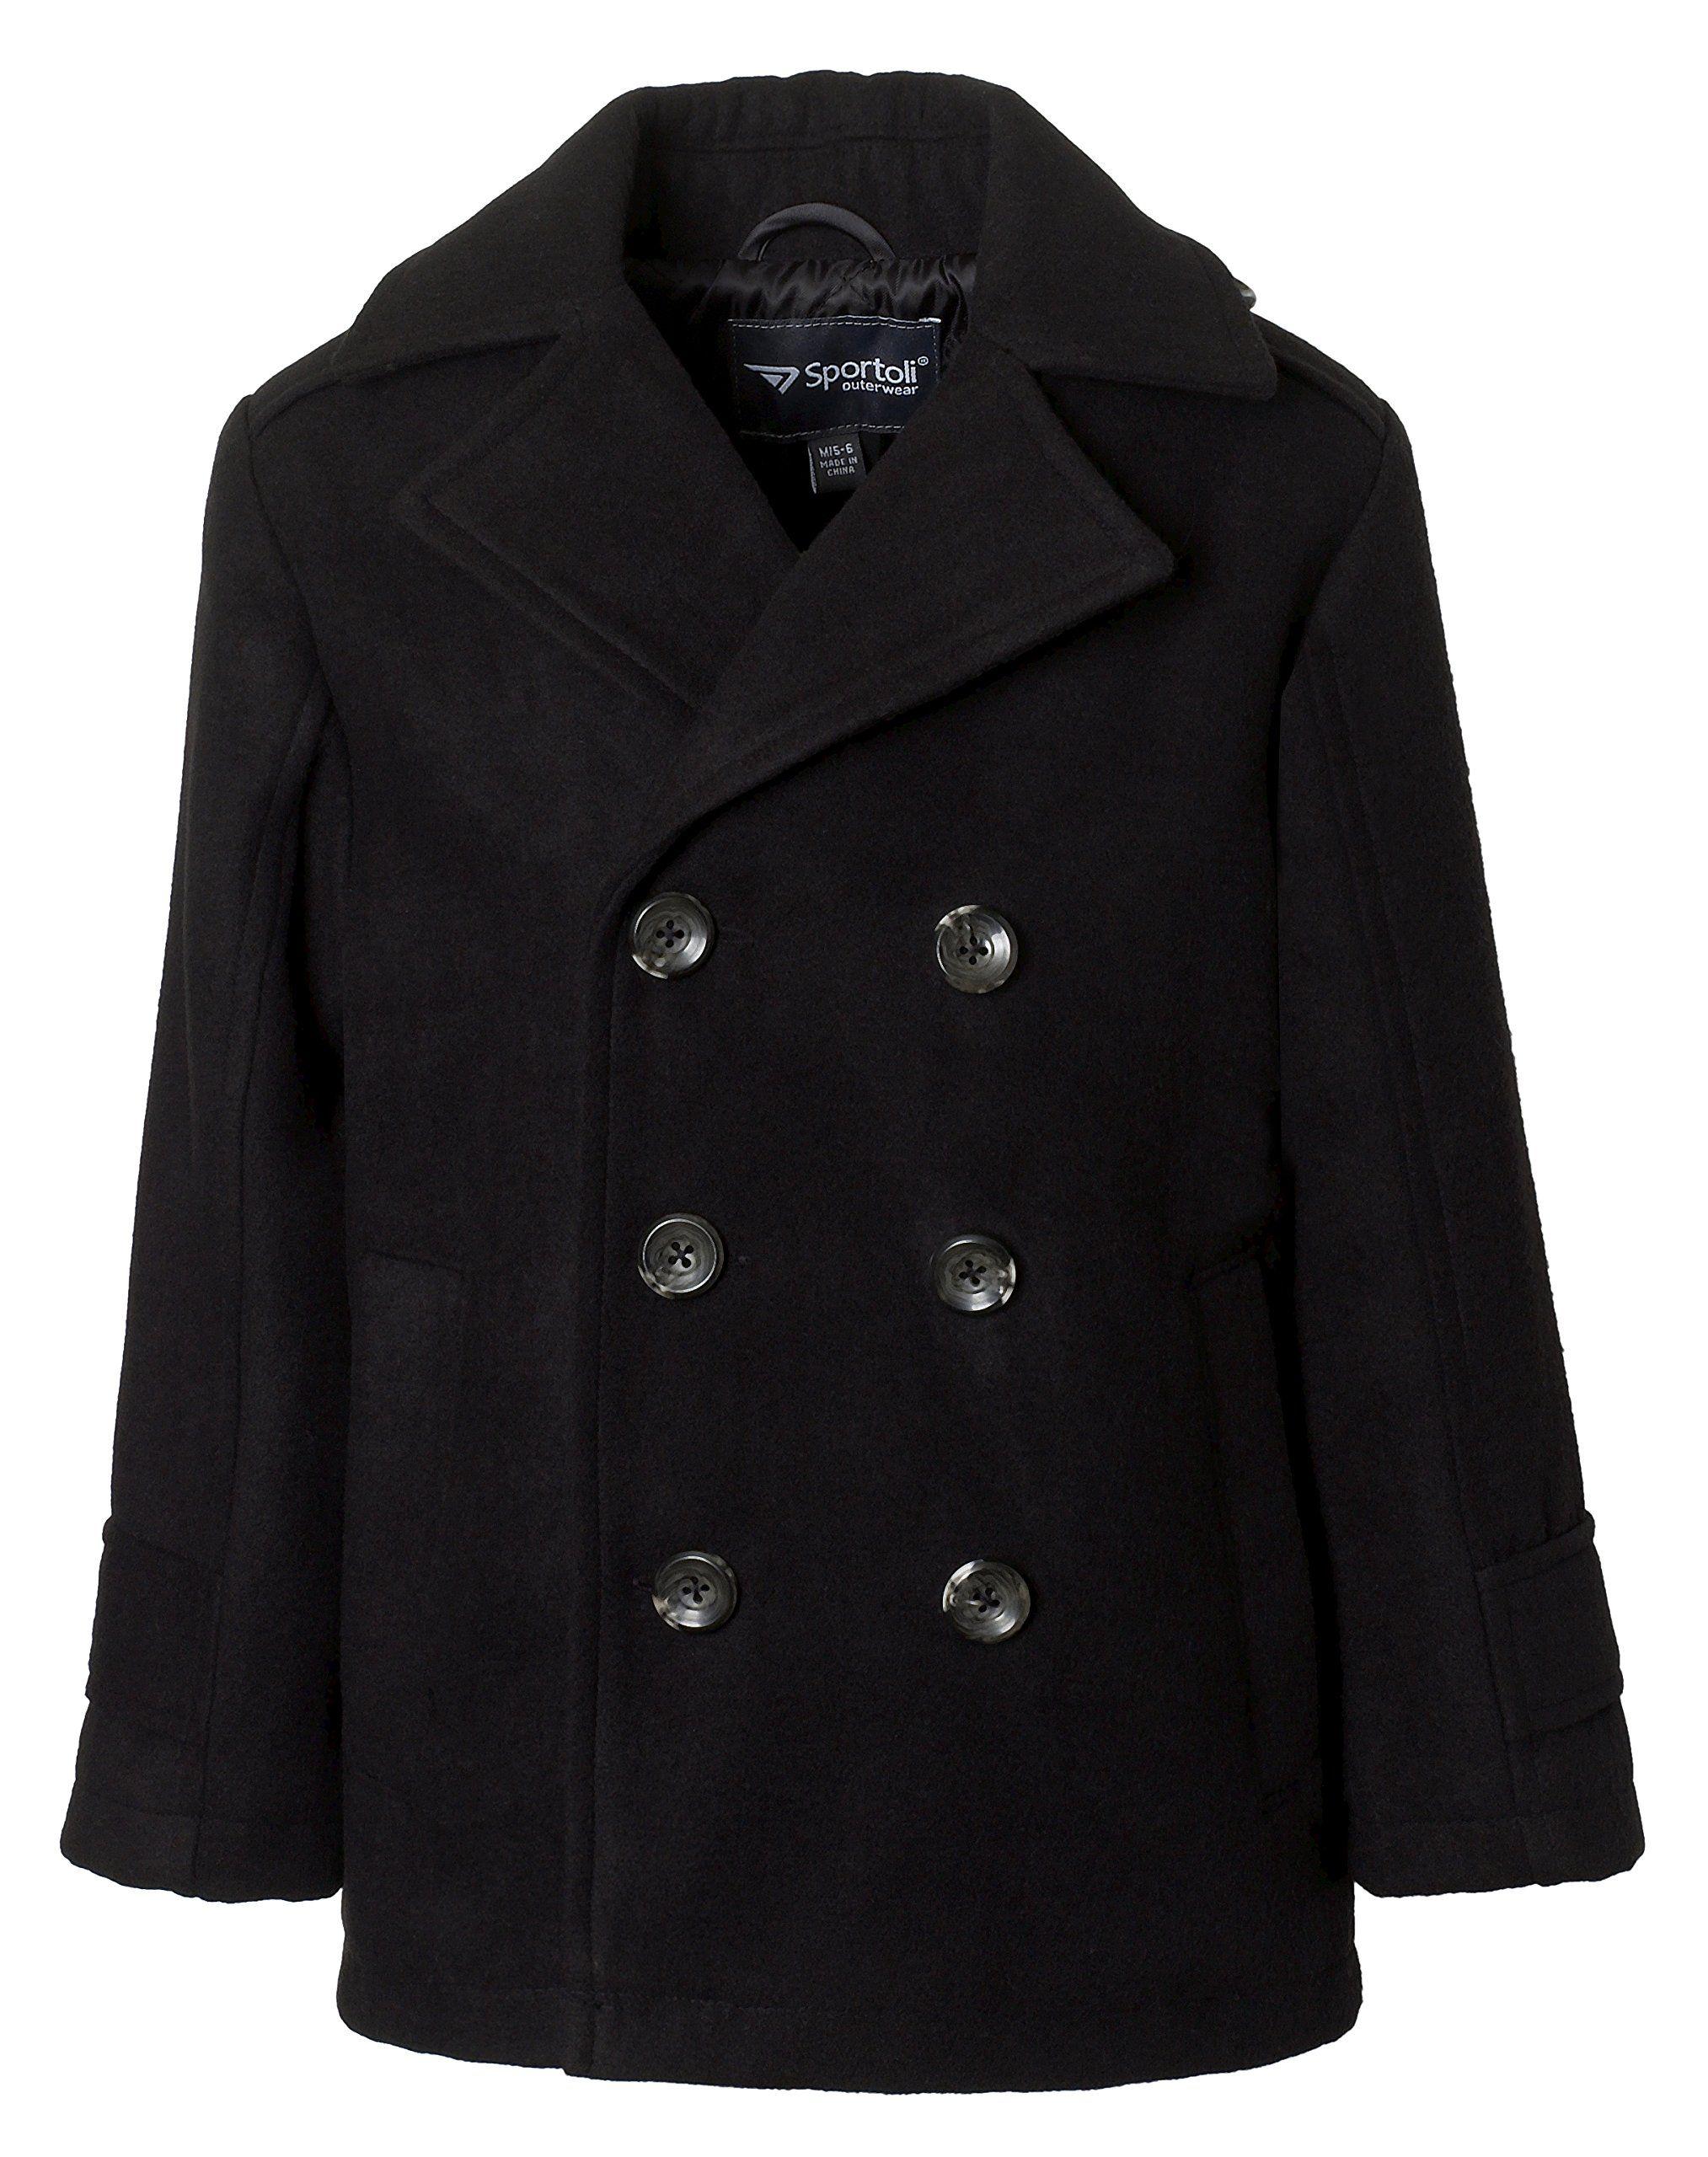 00fa0f3d8bd0 Sportoli Boys Classic Wool Look Quilt Lined Winter Dress Pea Coat ...